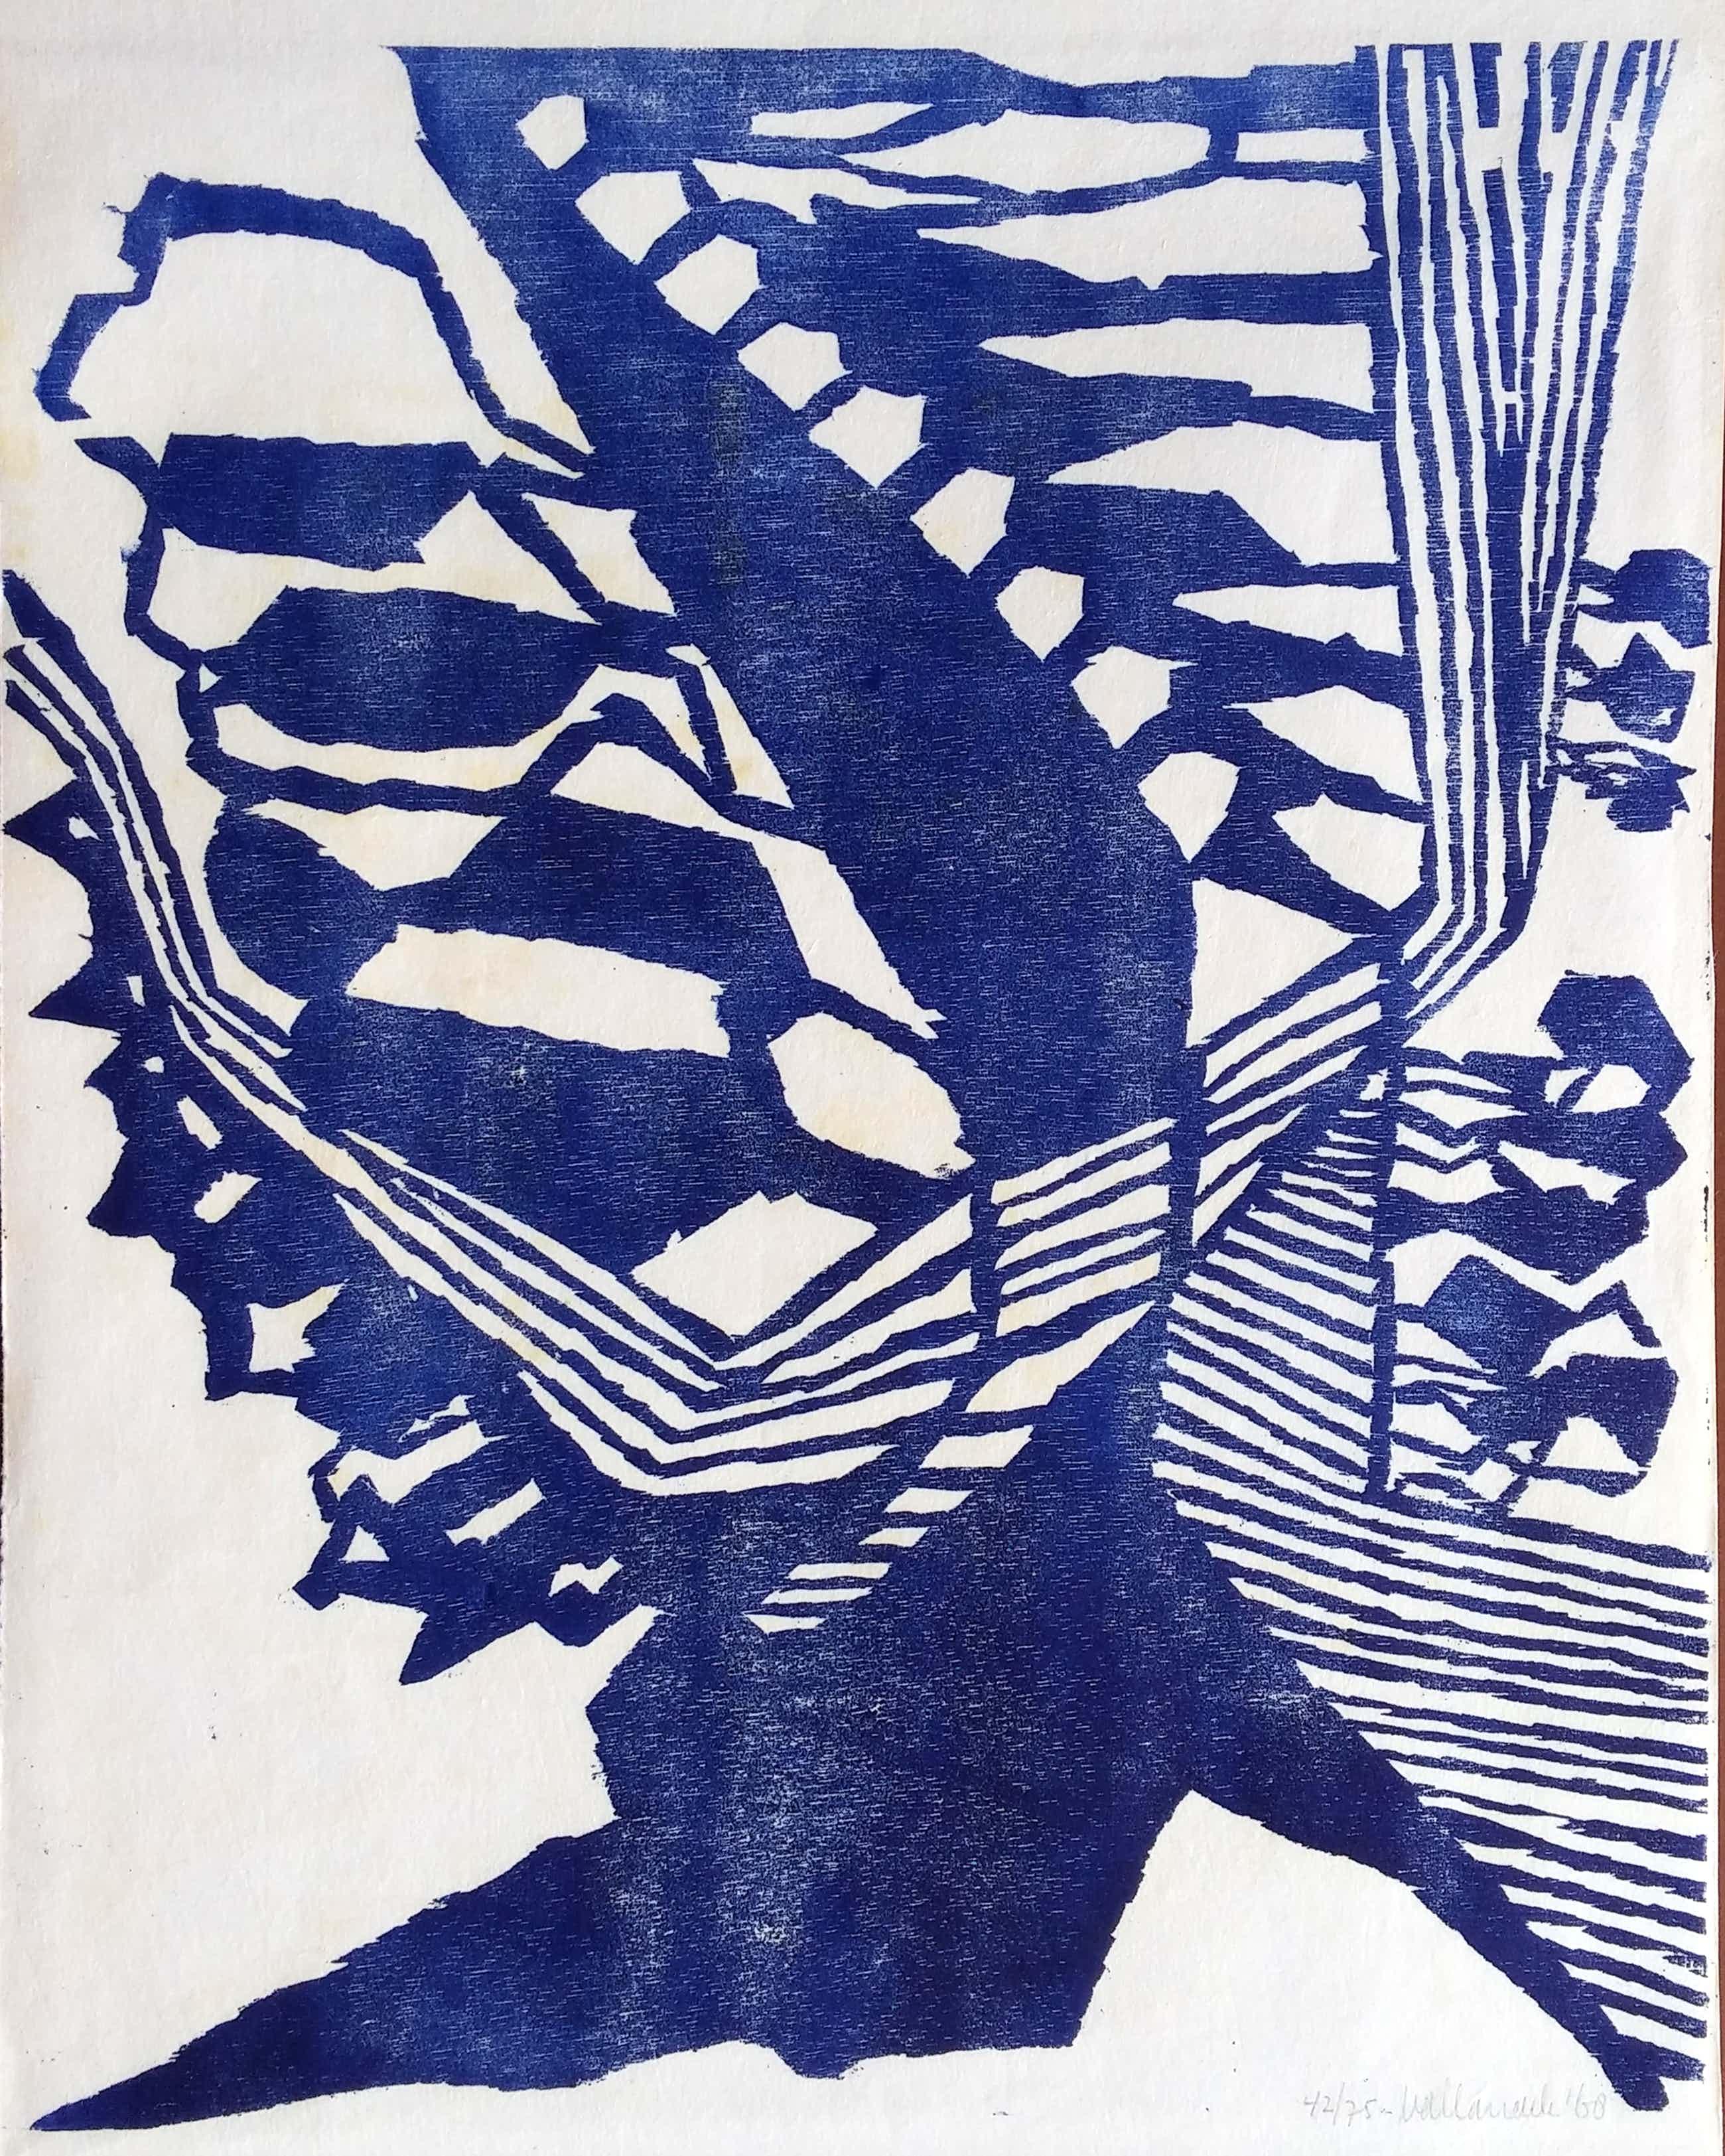 Anneke van der Mandele - abstracte houtsnede - 1968 - op Japans rijstpapier kopen? Bied vanaf 40!